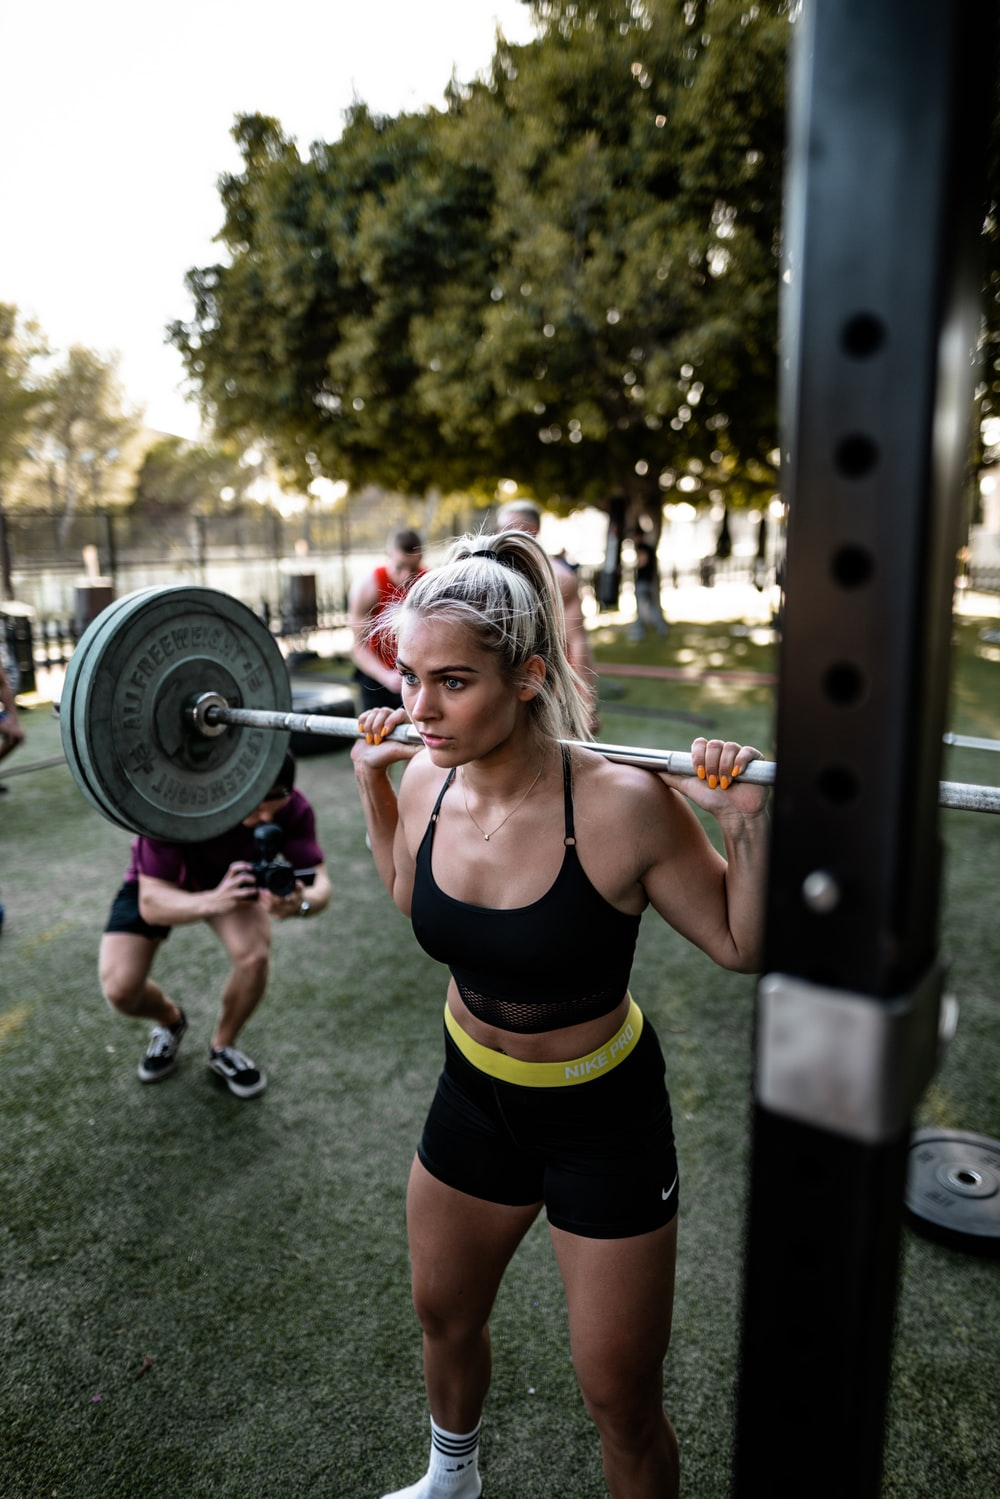 Cardio Machines - Are Gym Machines Necessary?